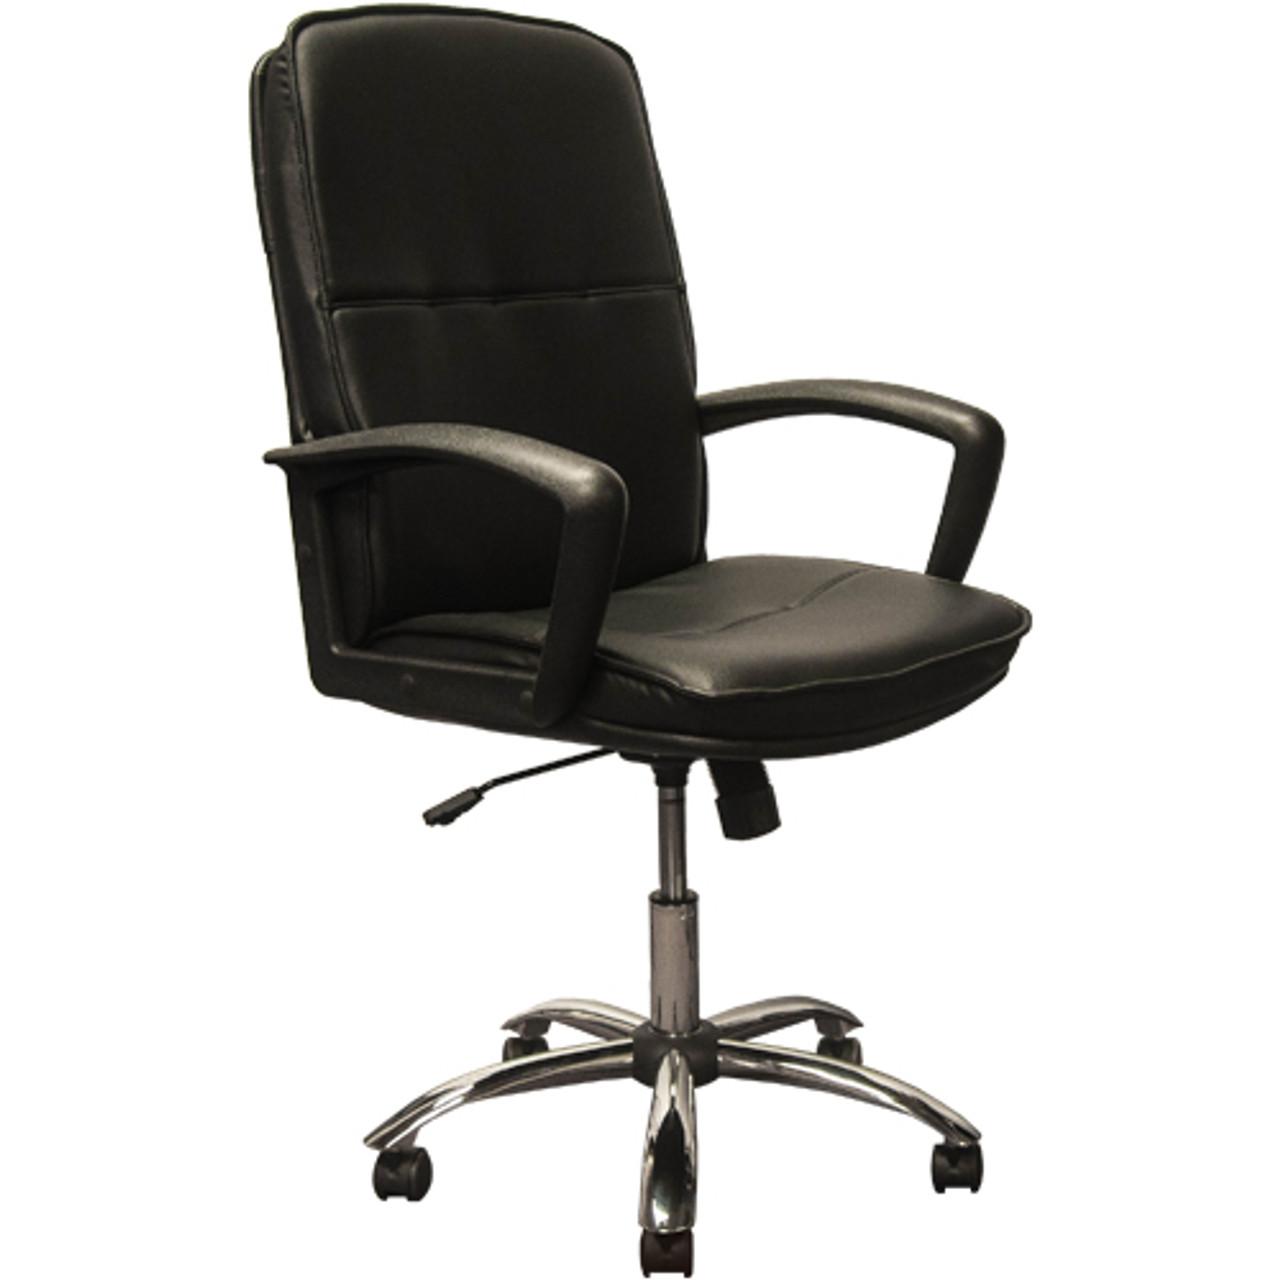 Surprising Advantage High Back Black Leather Executive Office Chair Chrome Base Kb 3003 Machost Co Dining Chair Design Ideas Machostcouk